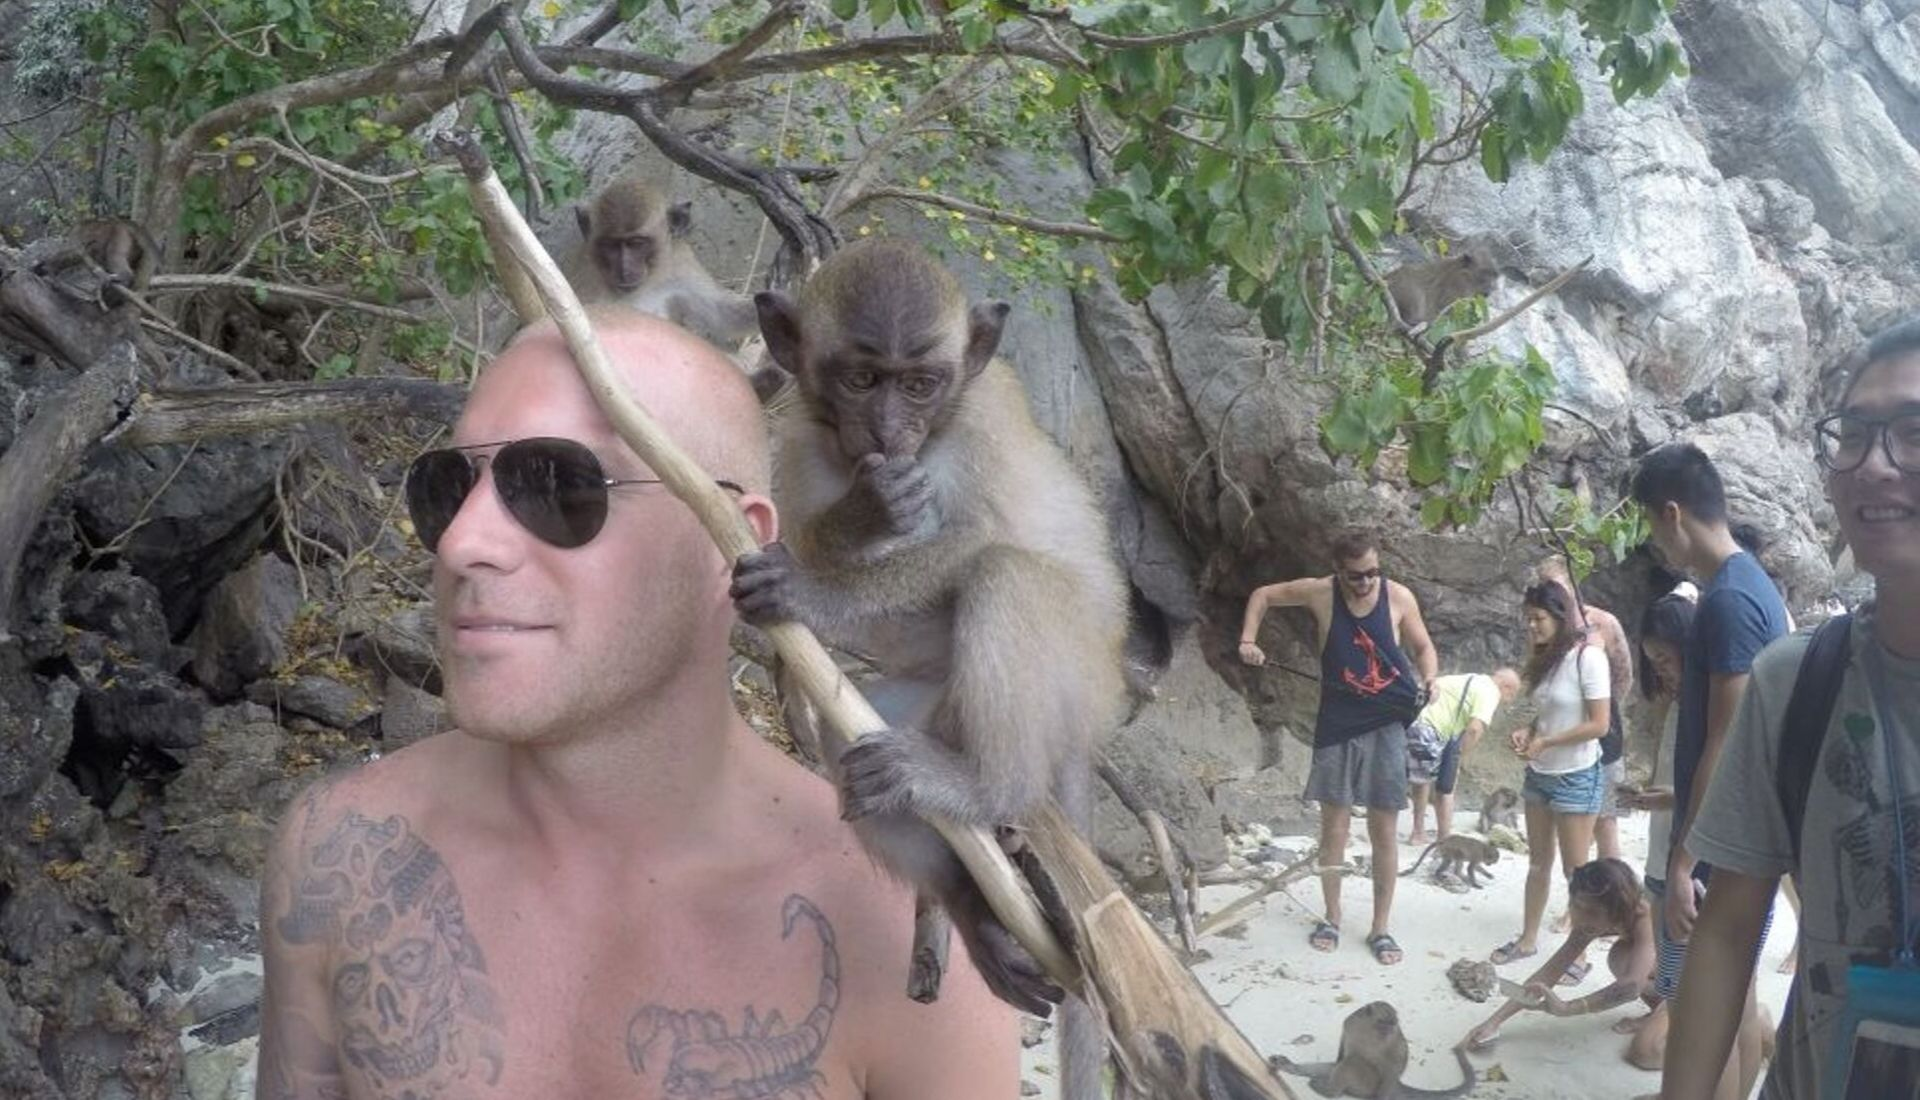 Exploring Asia - Monkey island